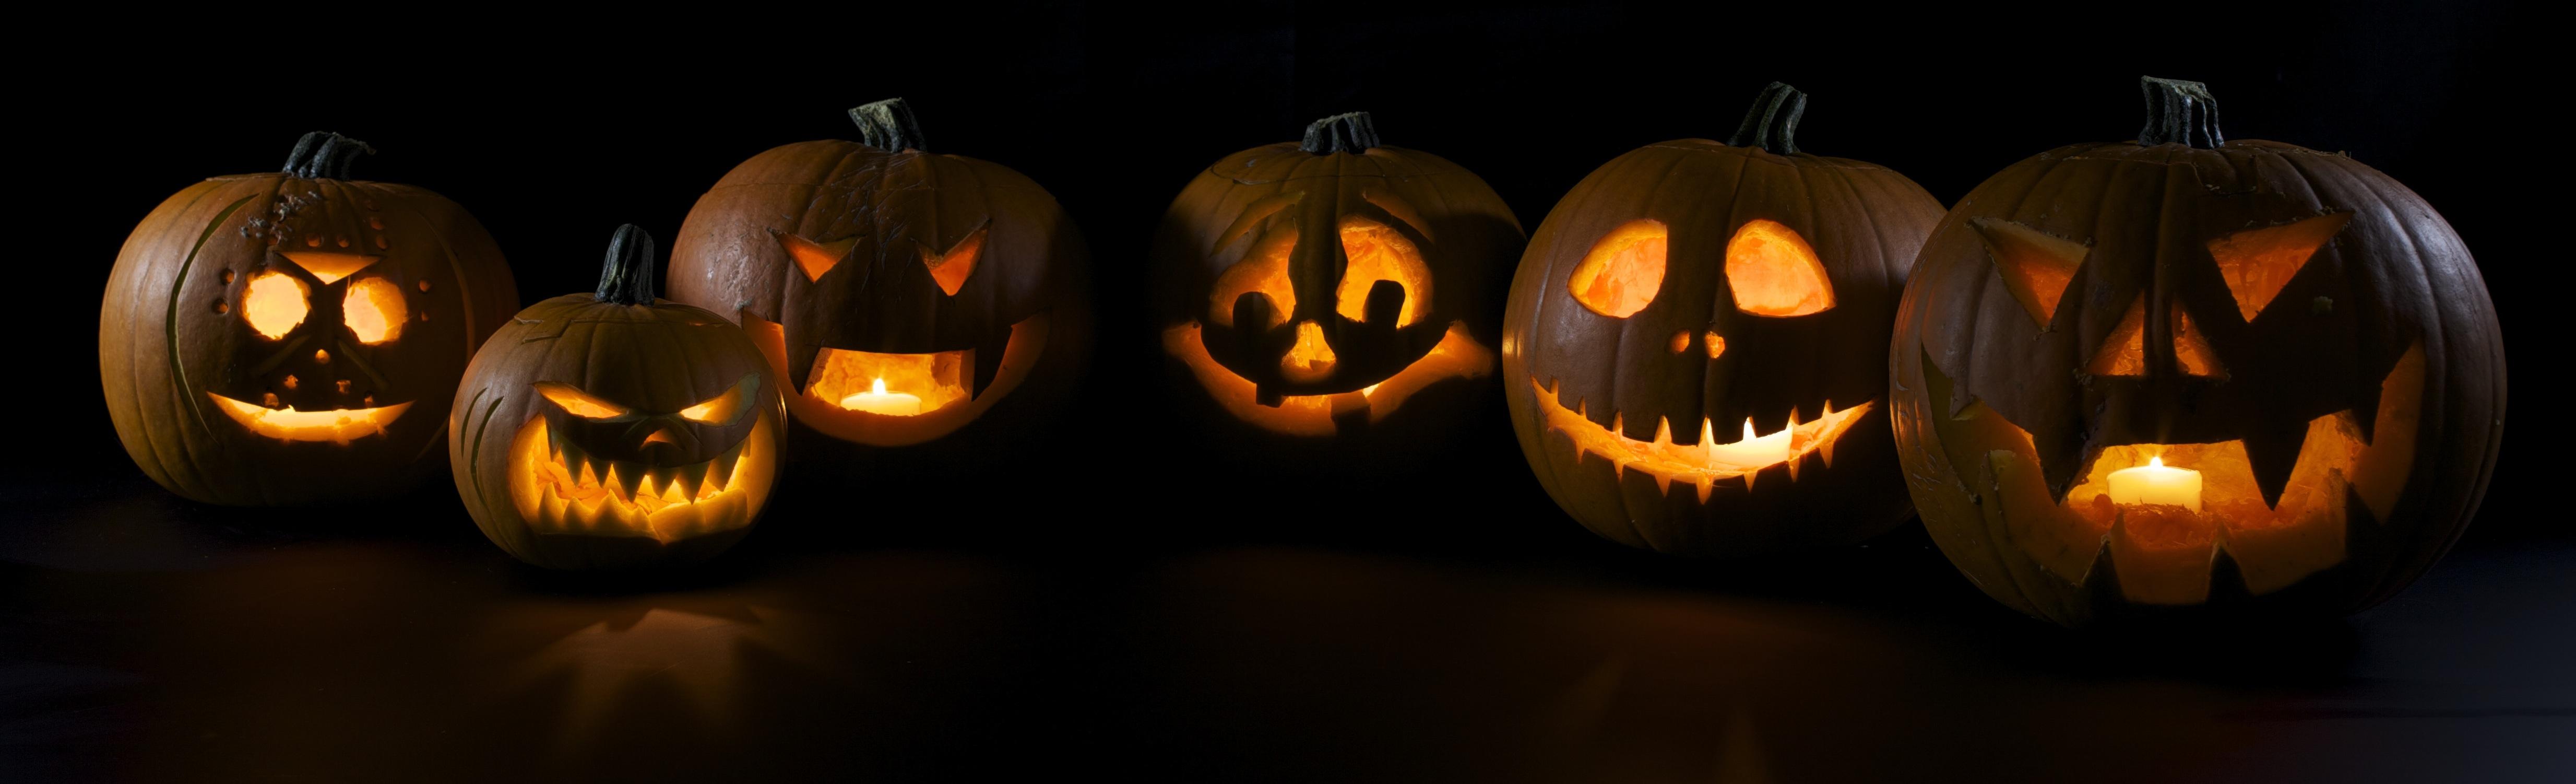 halloween pumpkin templates | ocado blog